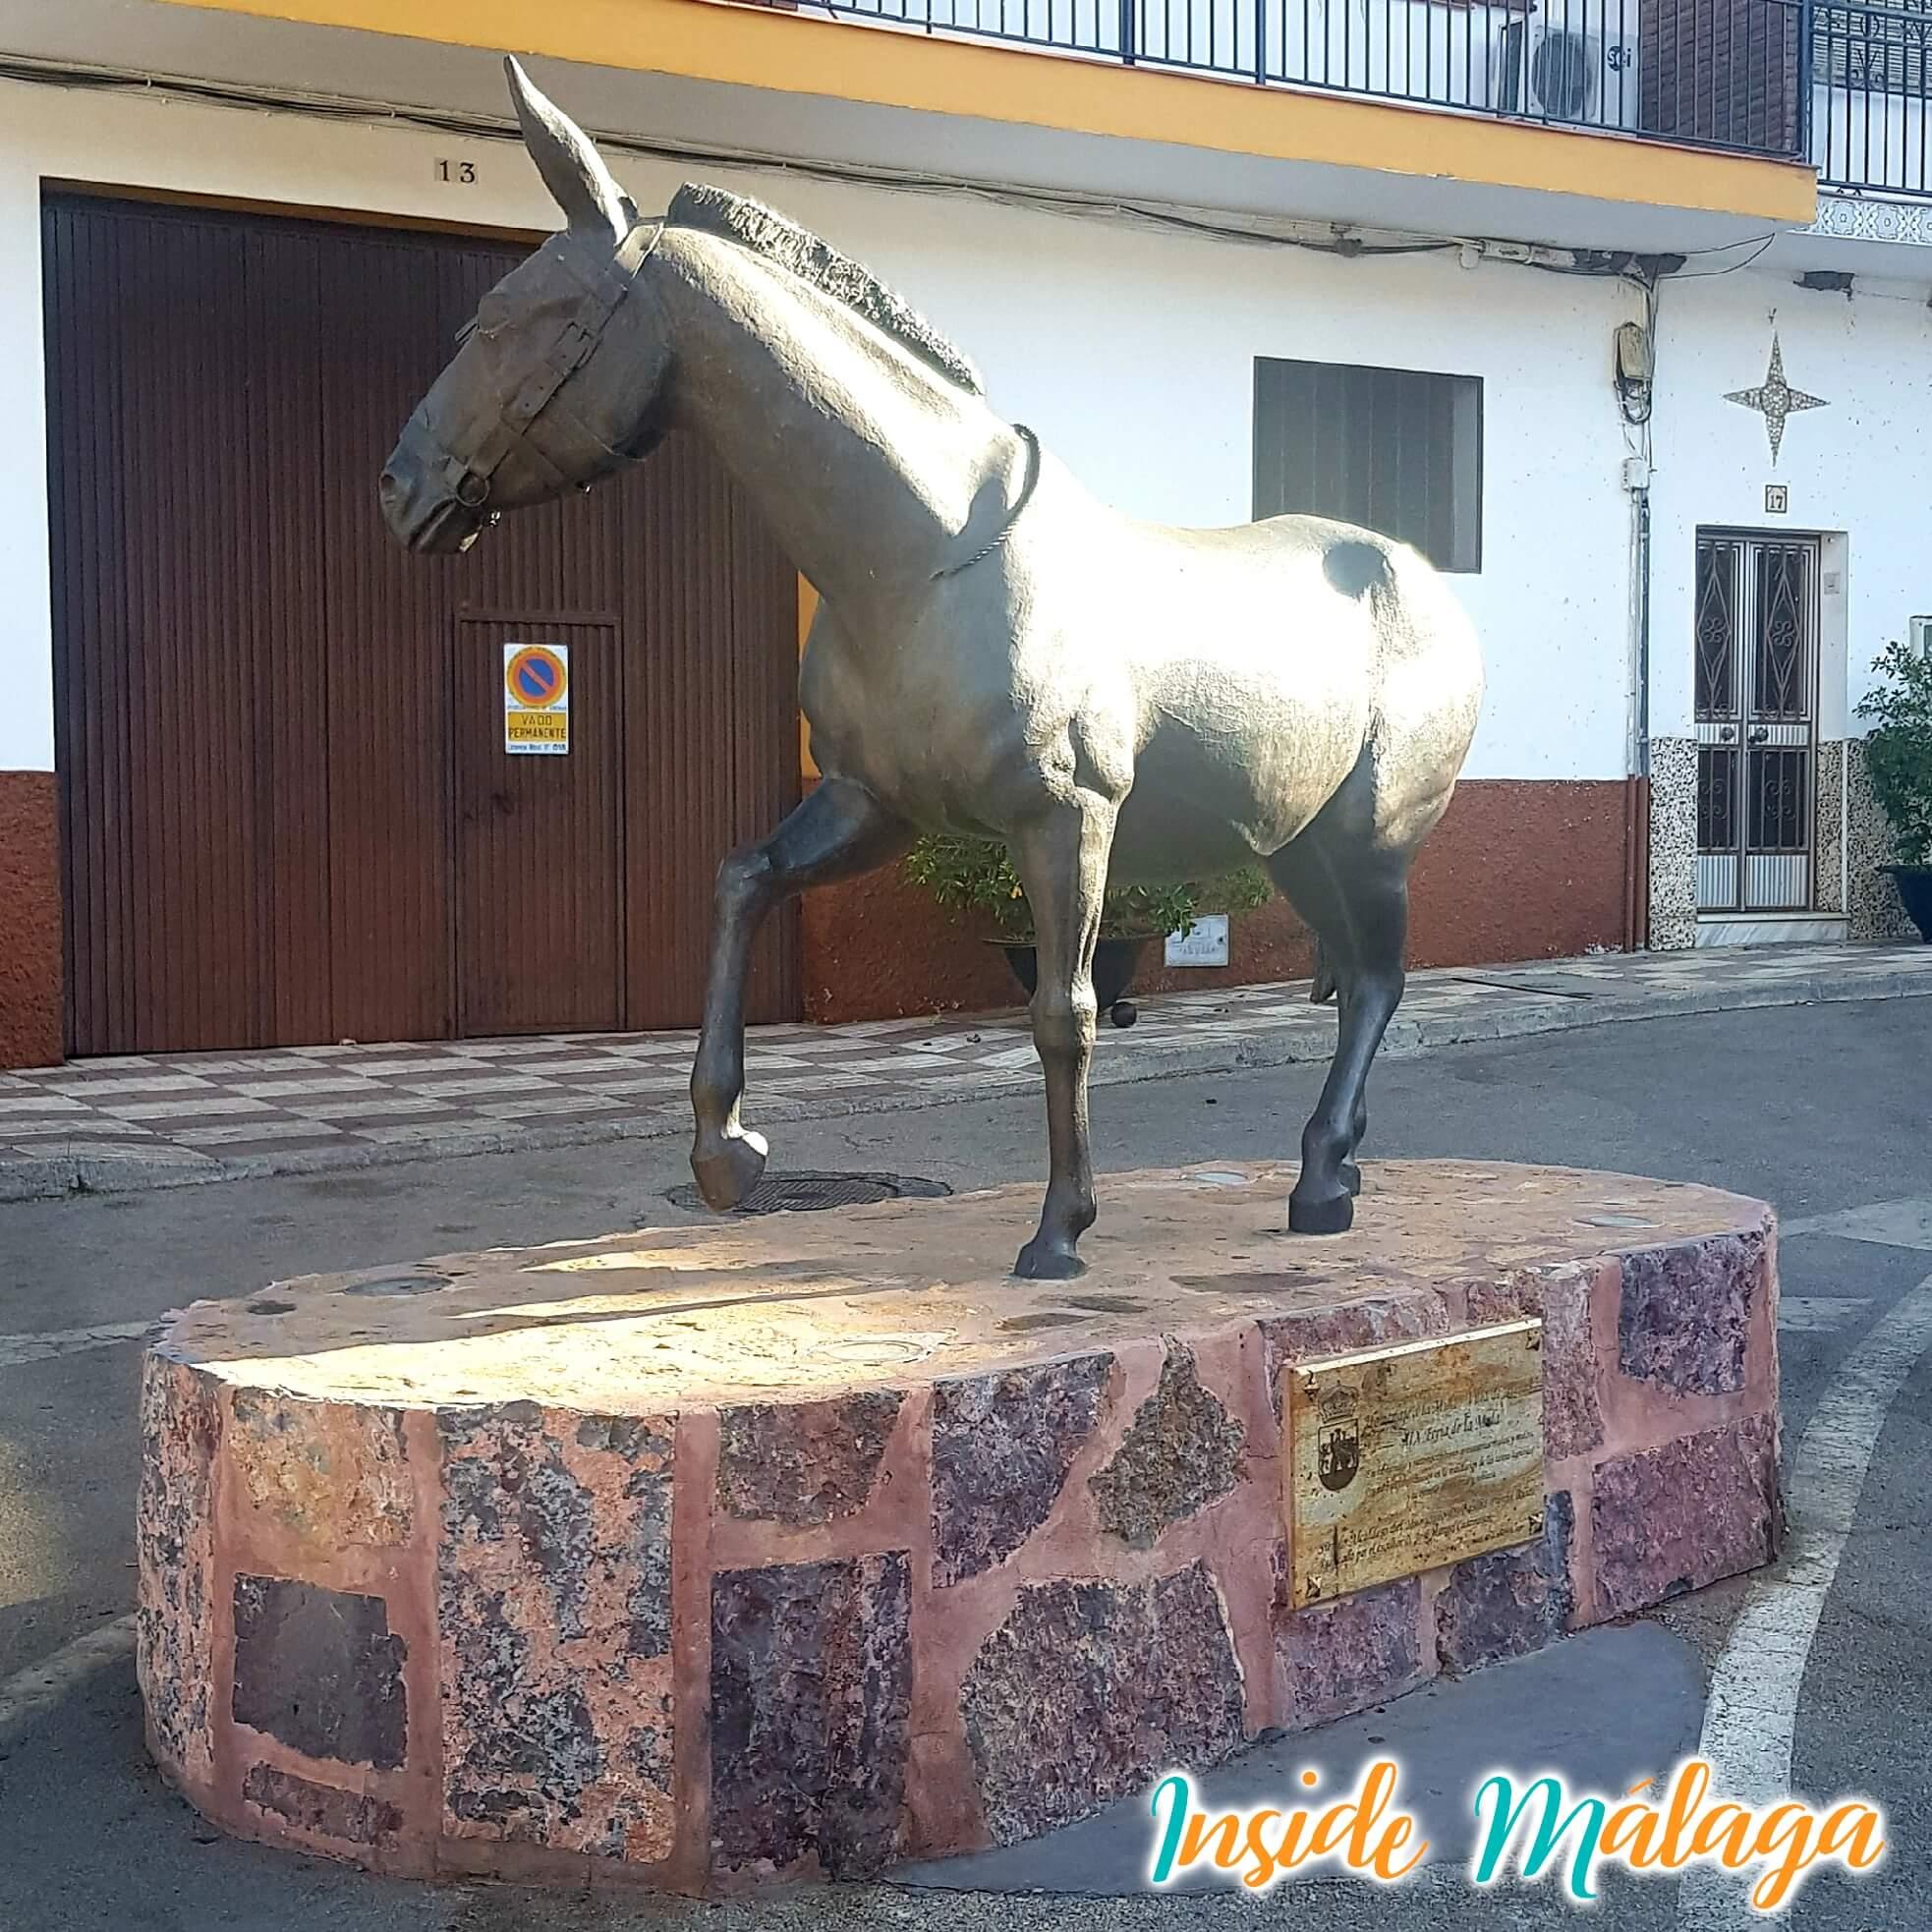 Fair of the Mule Arenas Malaga